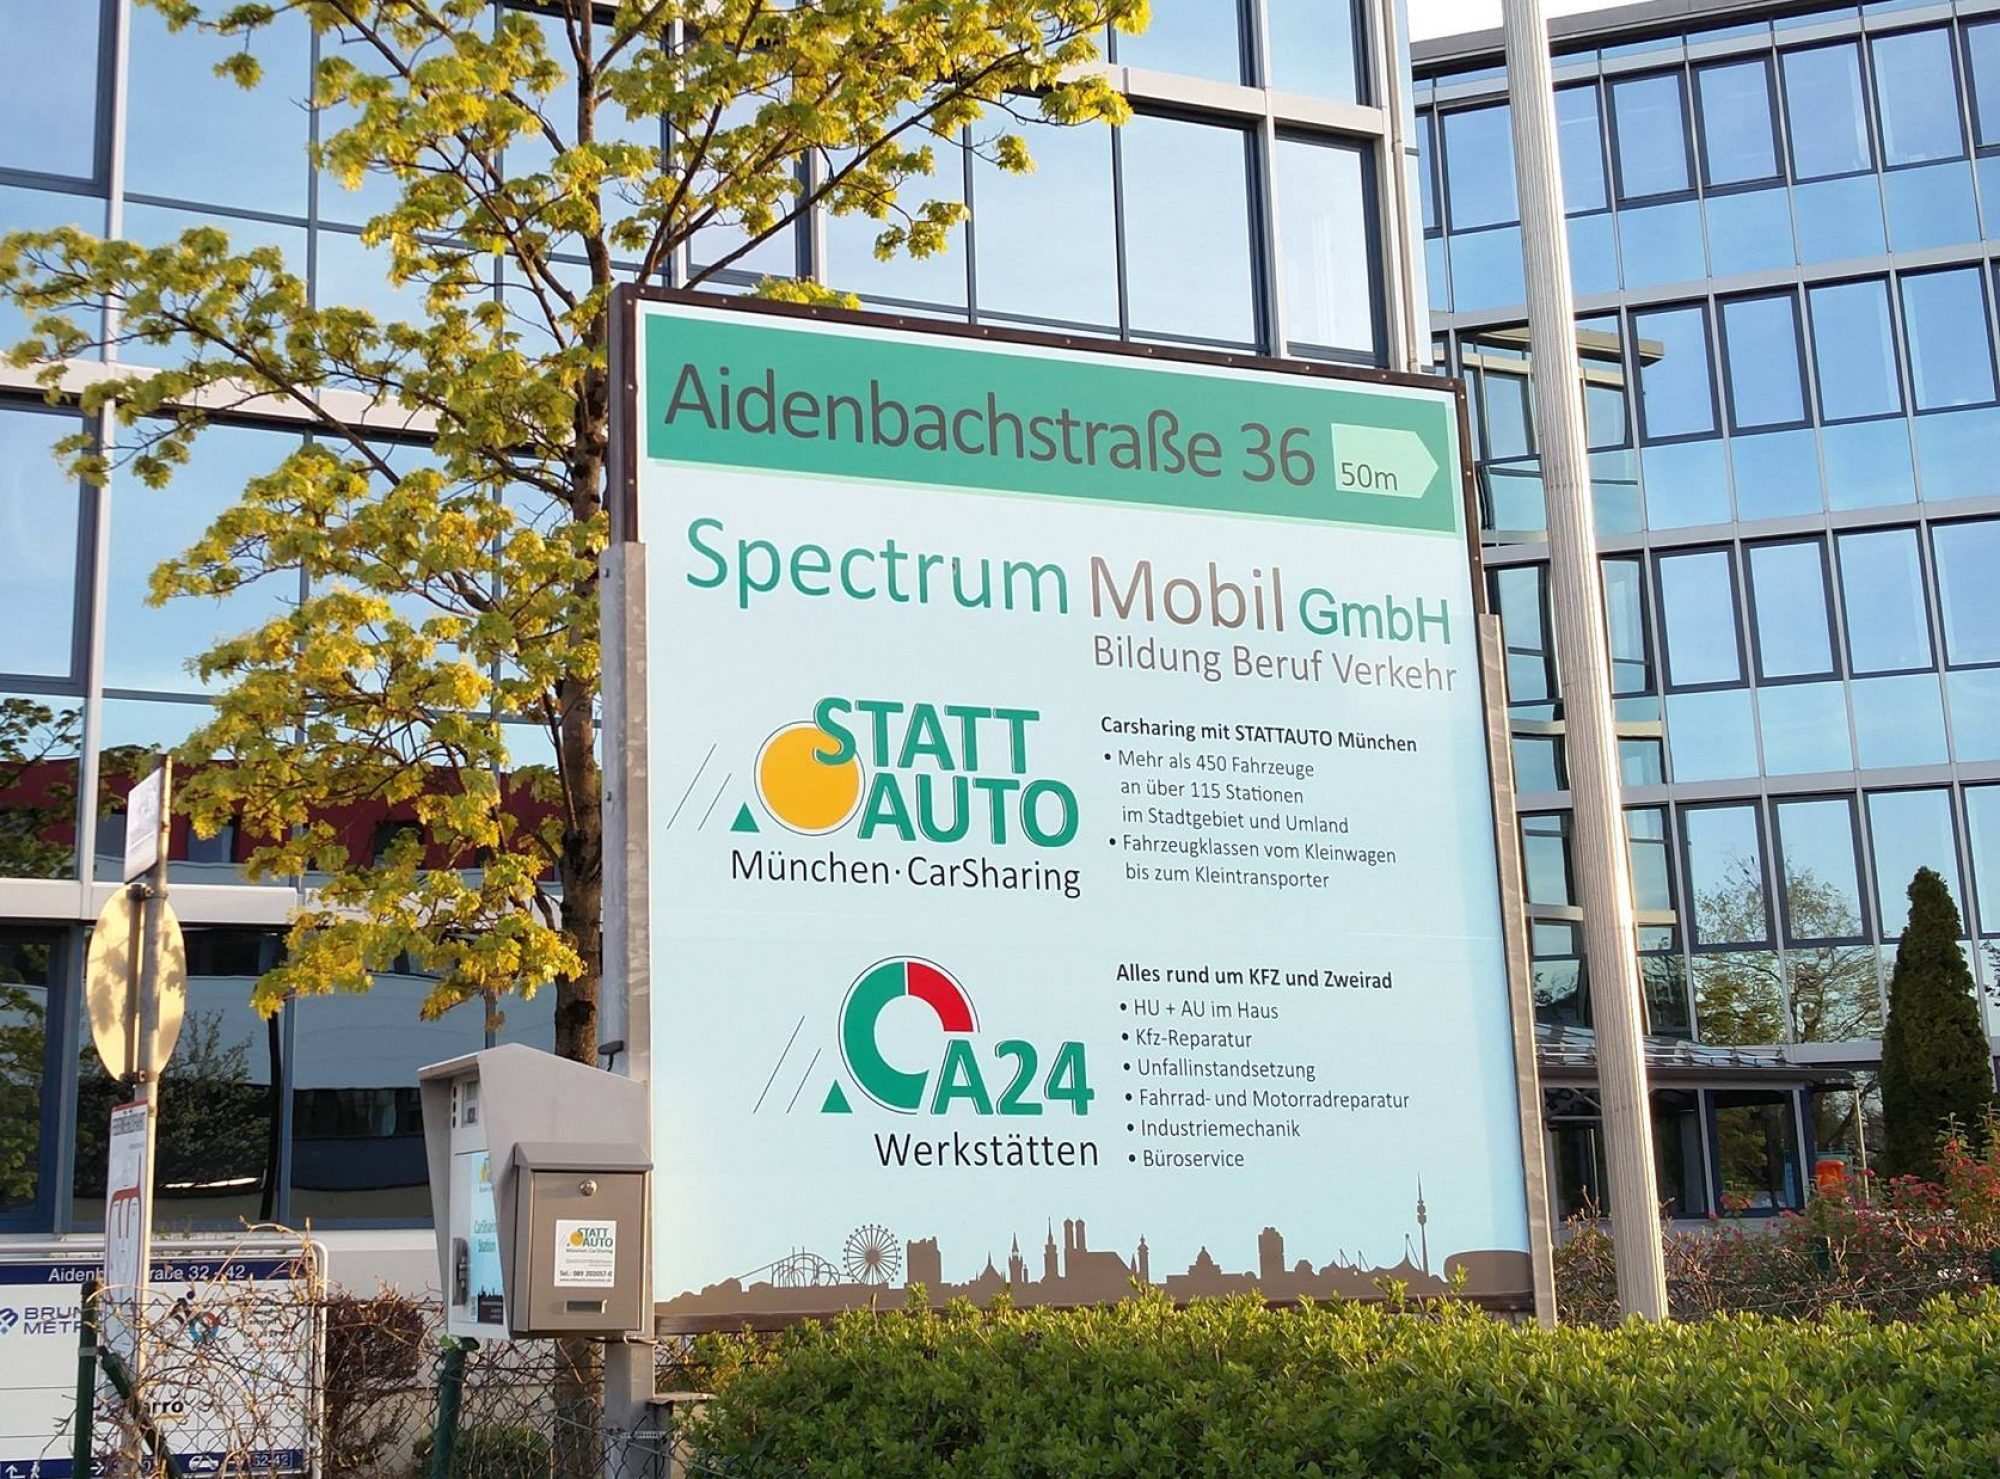 Spectrum Mobil GmbH